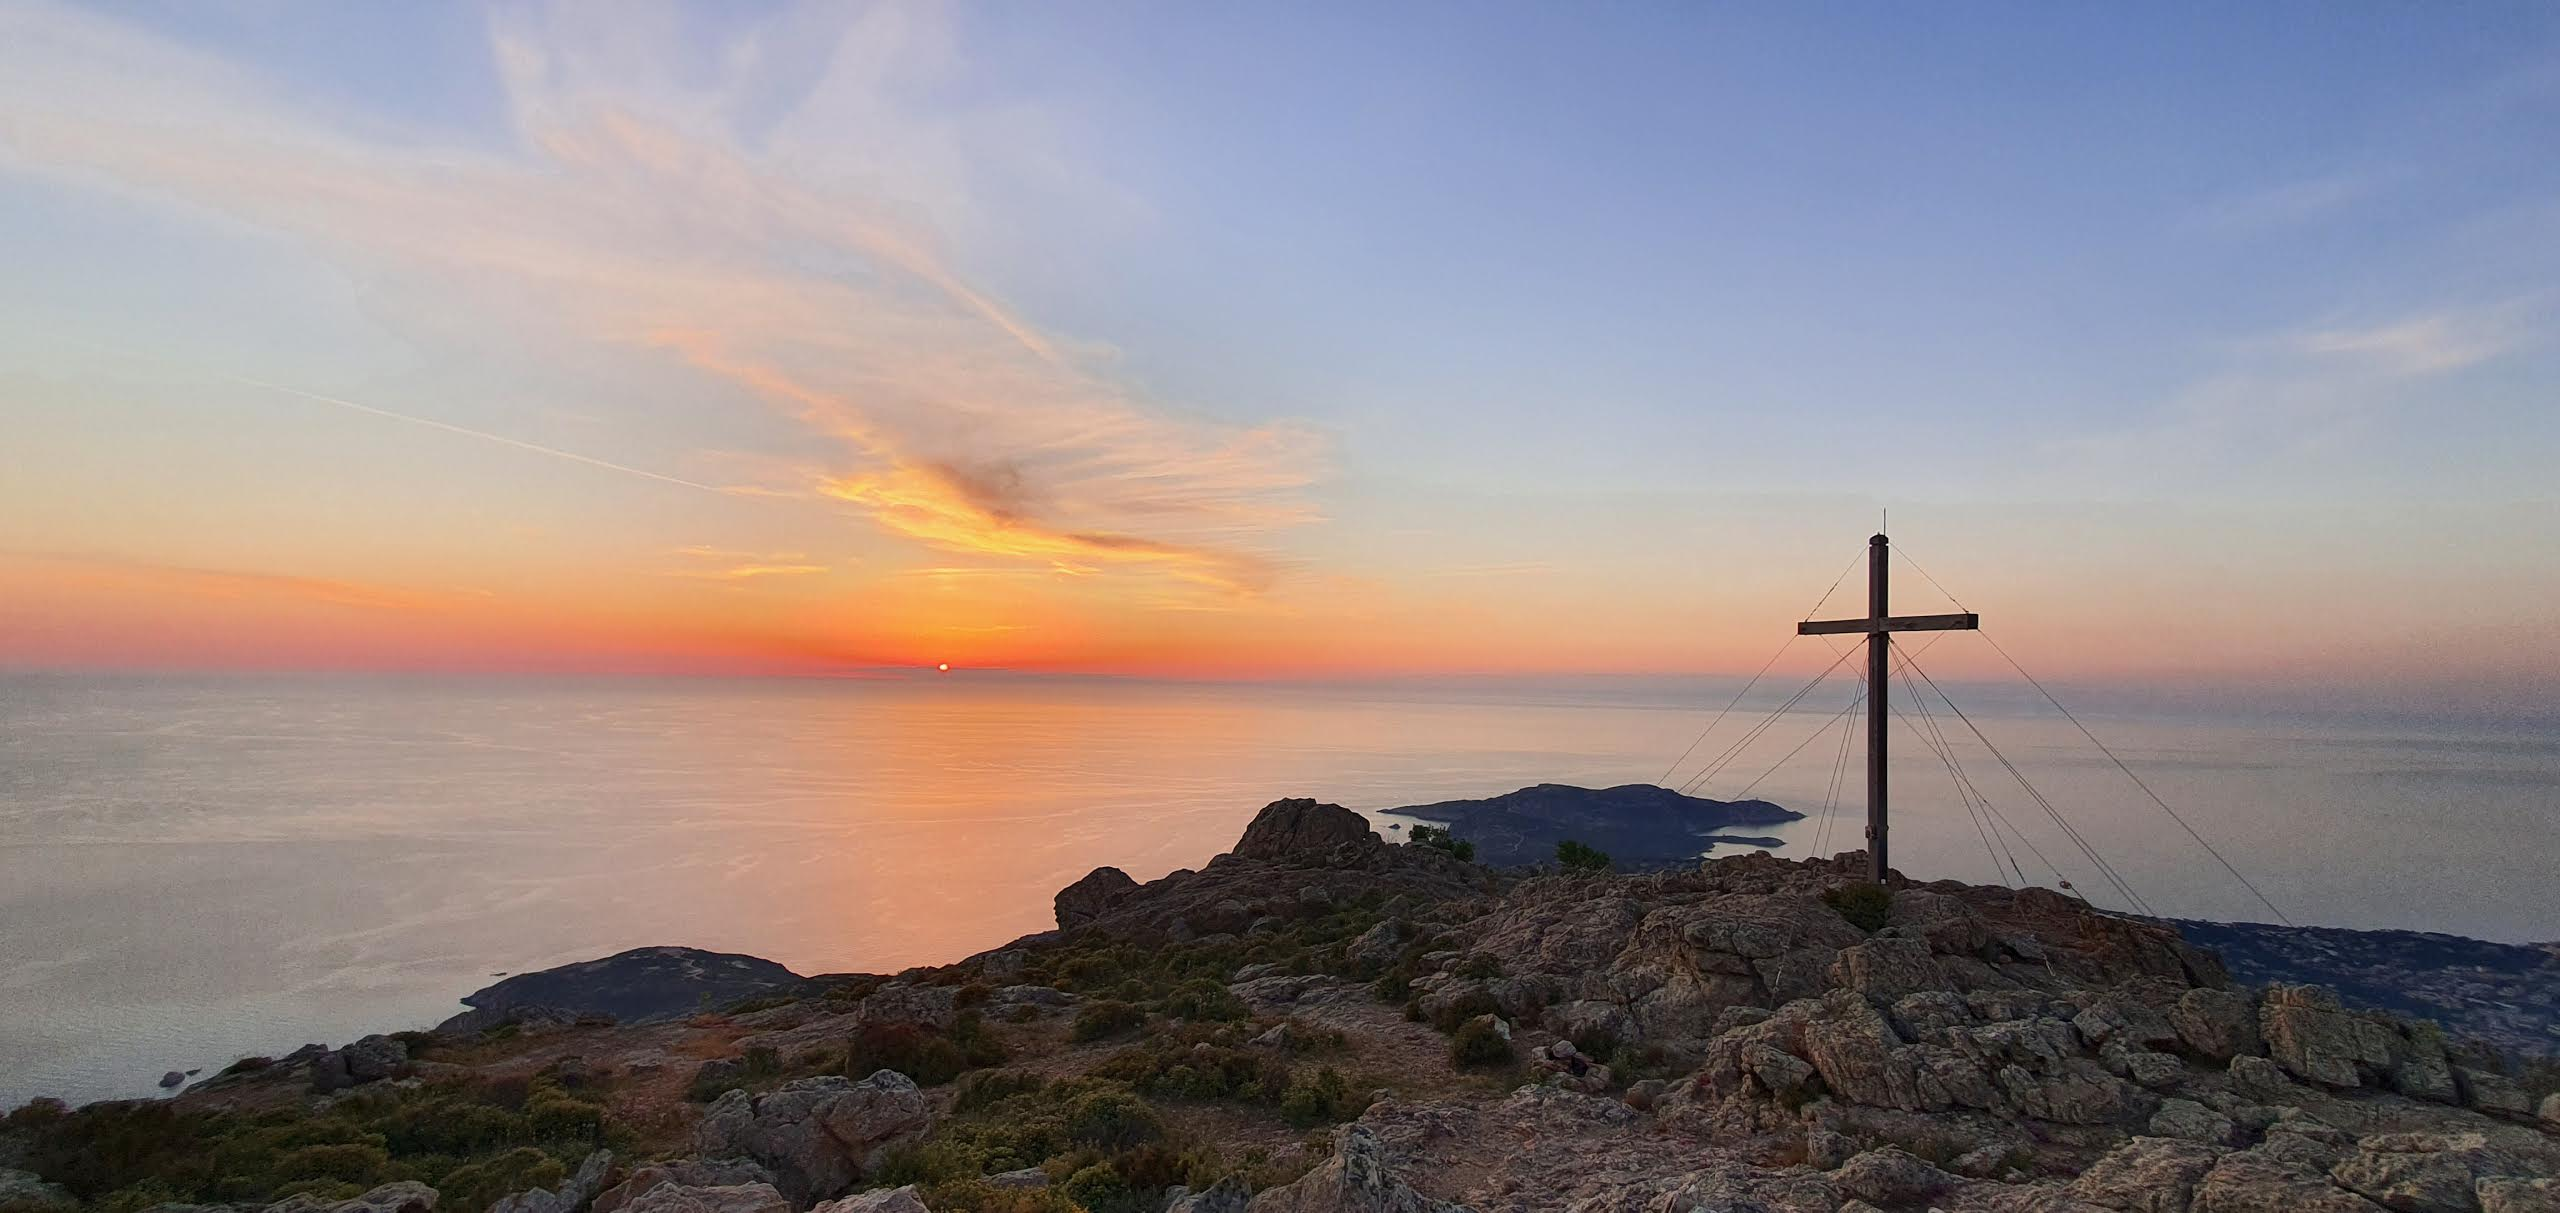 La photo du jour : coucher de soleil  à Capu di a Veta